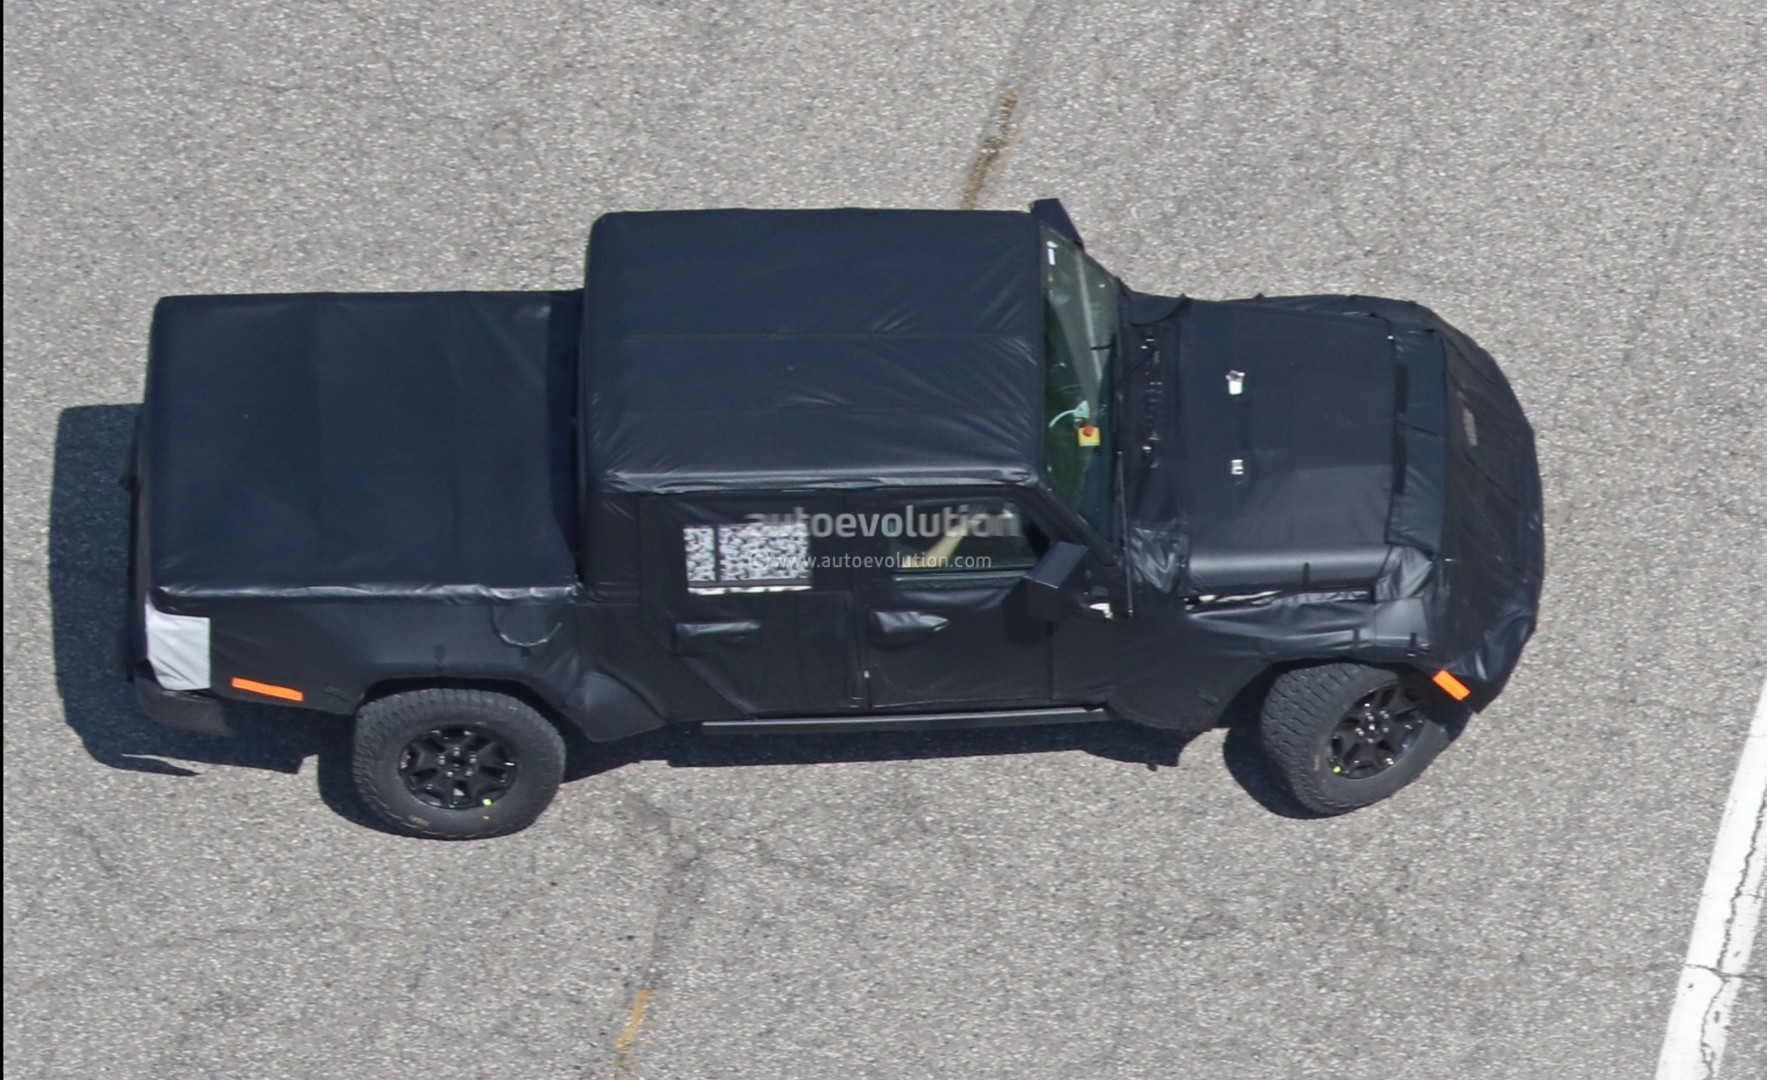 2019 Jeep Scrambler Jt Pickup Truck To Get V6 Sel Engine Three